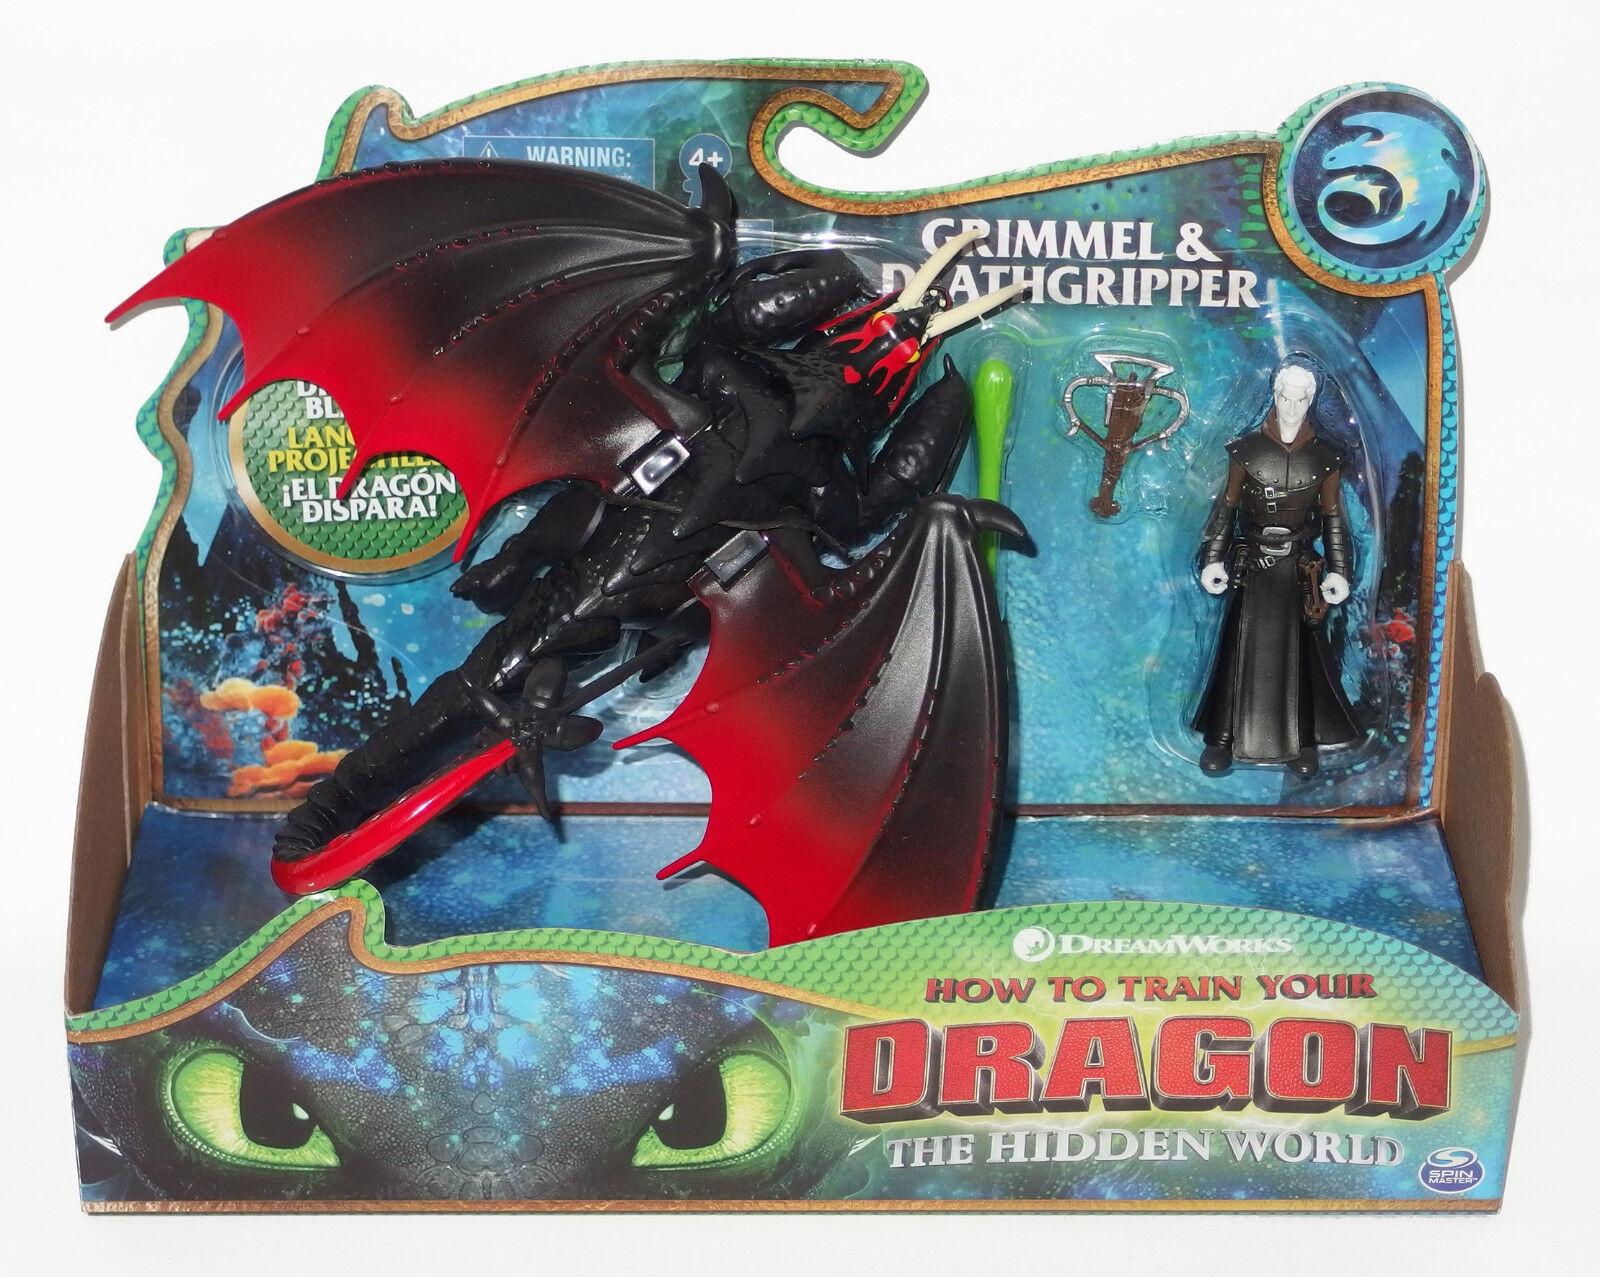 Dragons 3 Hidden World Die Die World geheime Welt Grimmel Stormfly Deathgripper Hookfang 801aaa